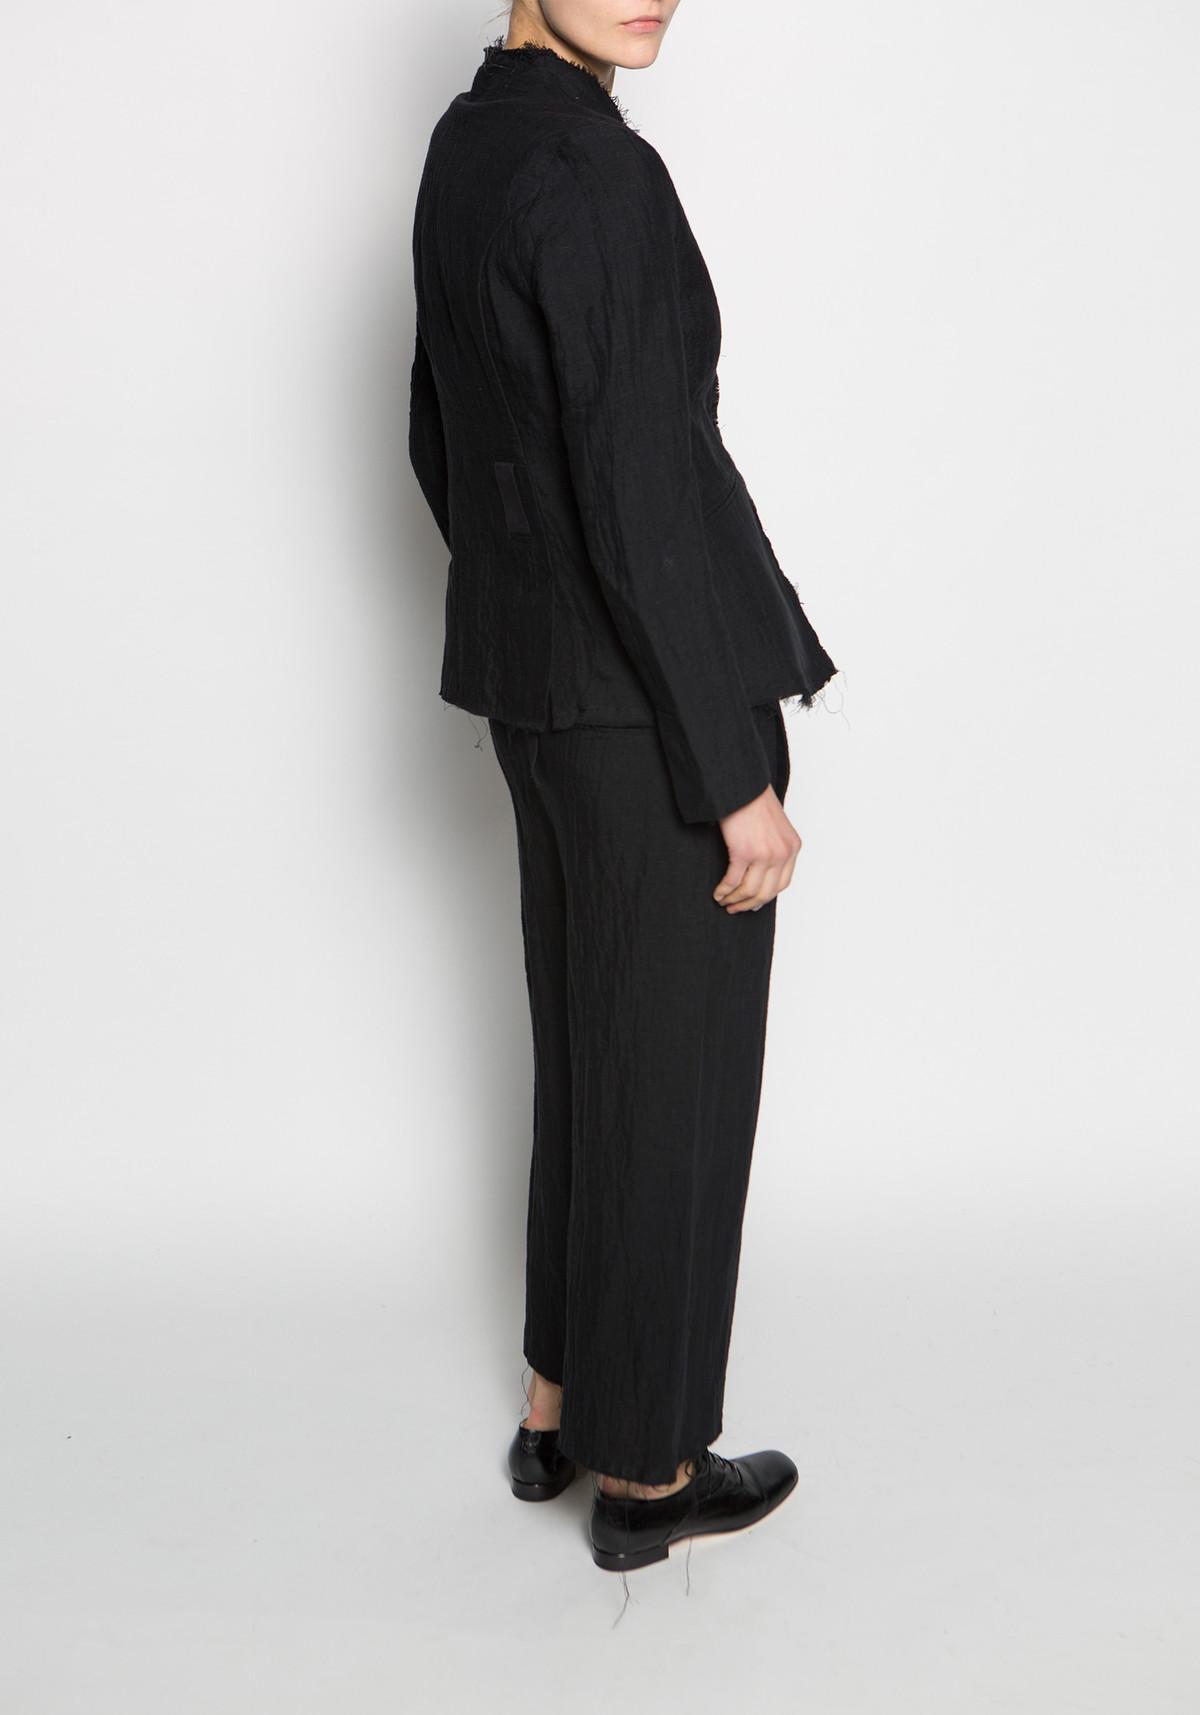 thom krom thom krom high waisted wide leg hose trouser garmentory. Black Bedroom Furniture Sets. Home Design Ideas